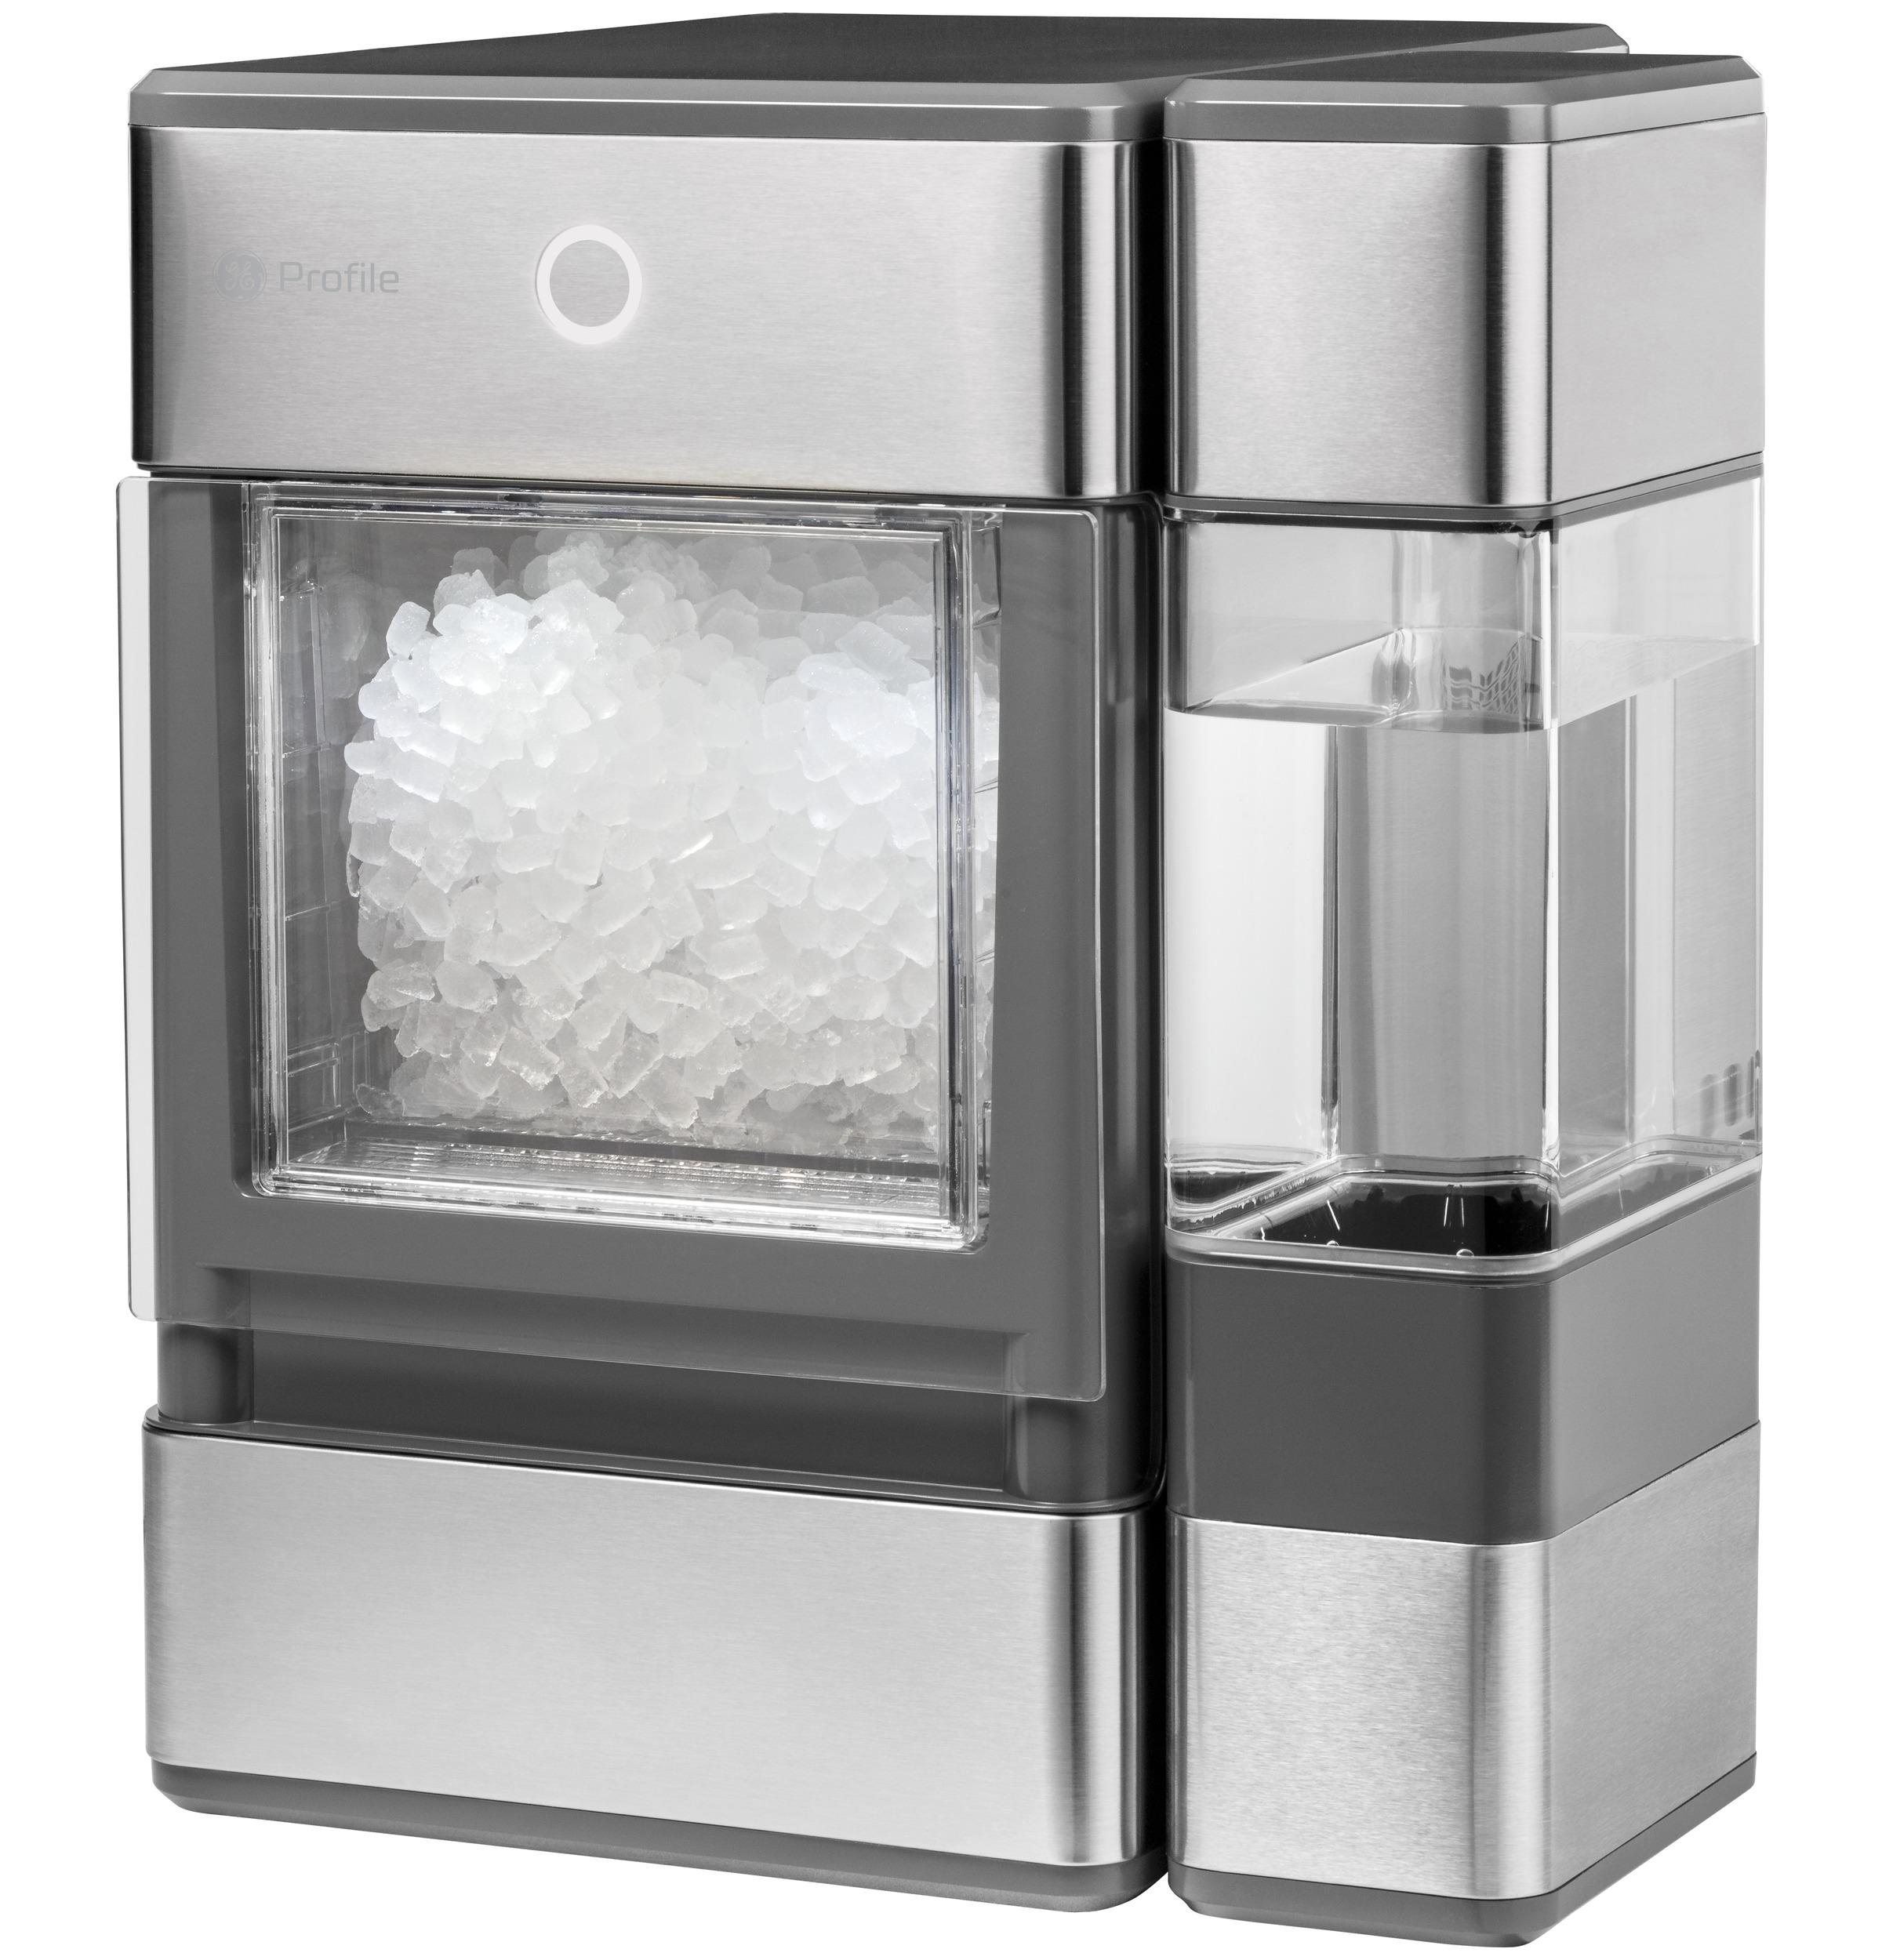 Model: OPAL01GEPKT | GE Profile GE Profile™ Opal Nugget Ice Maker